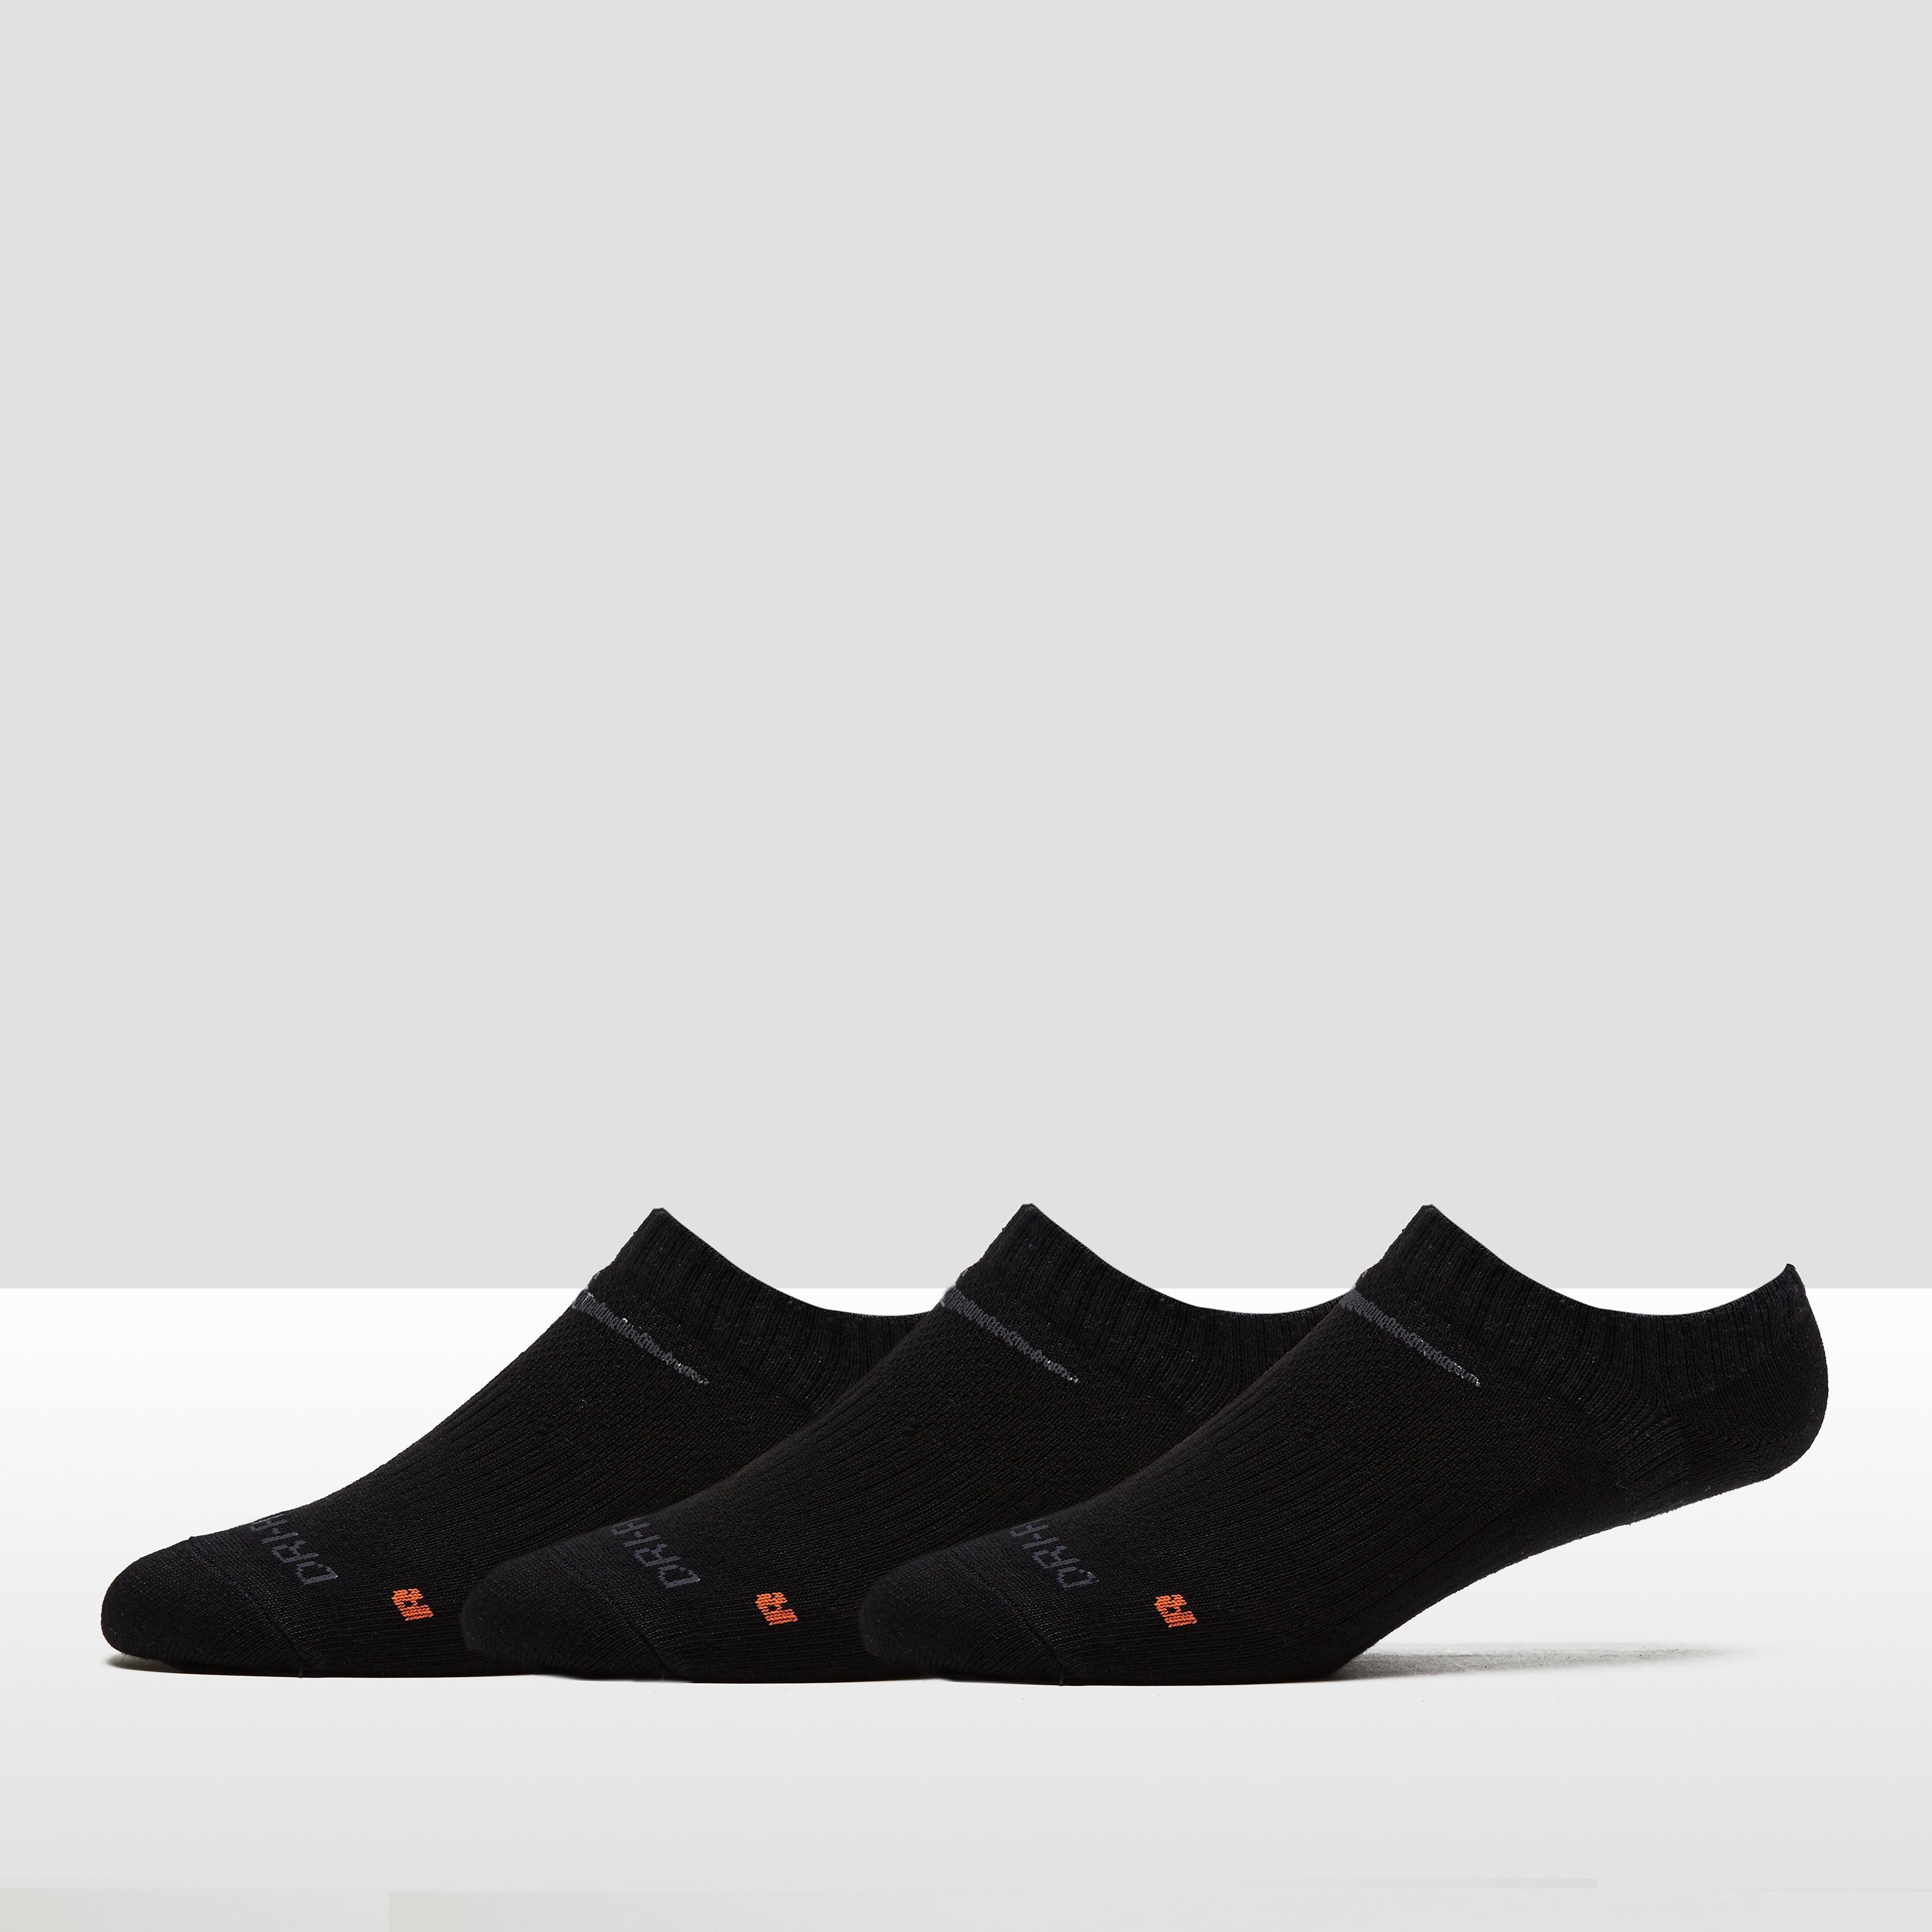 Nike hardloopsokken